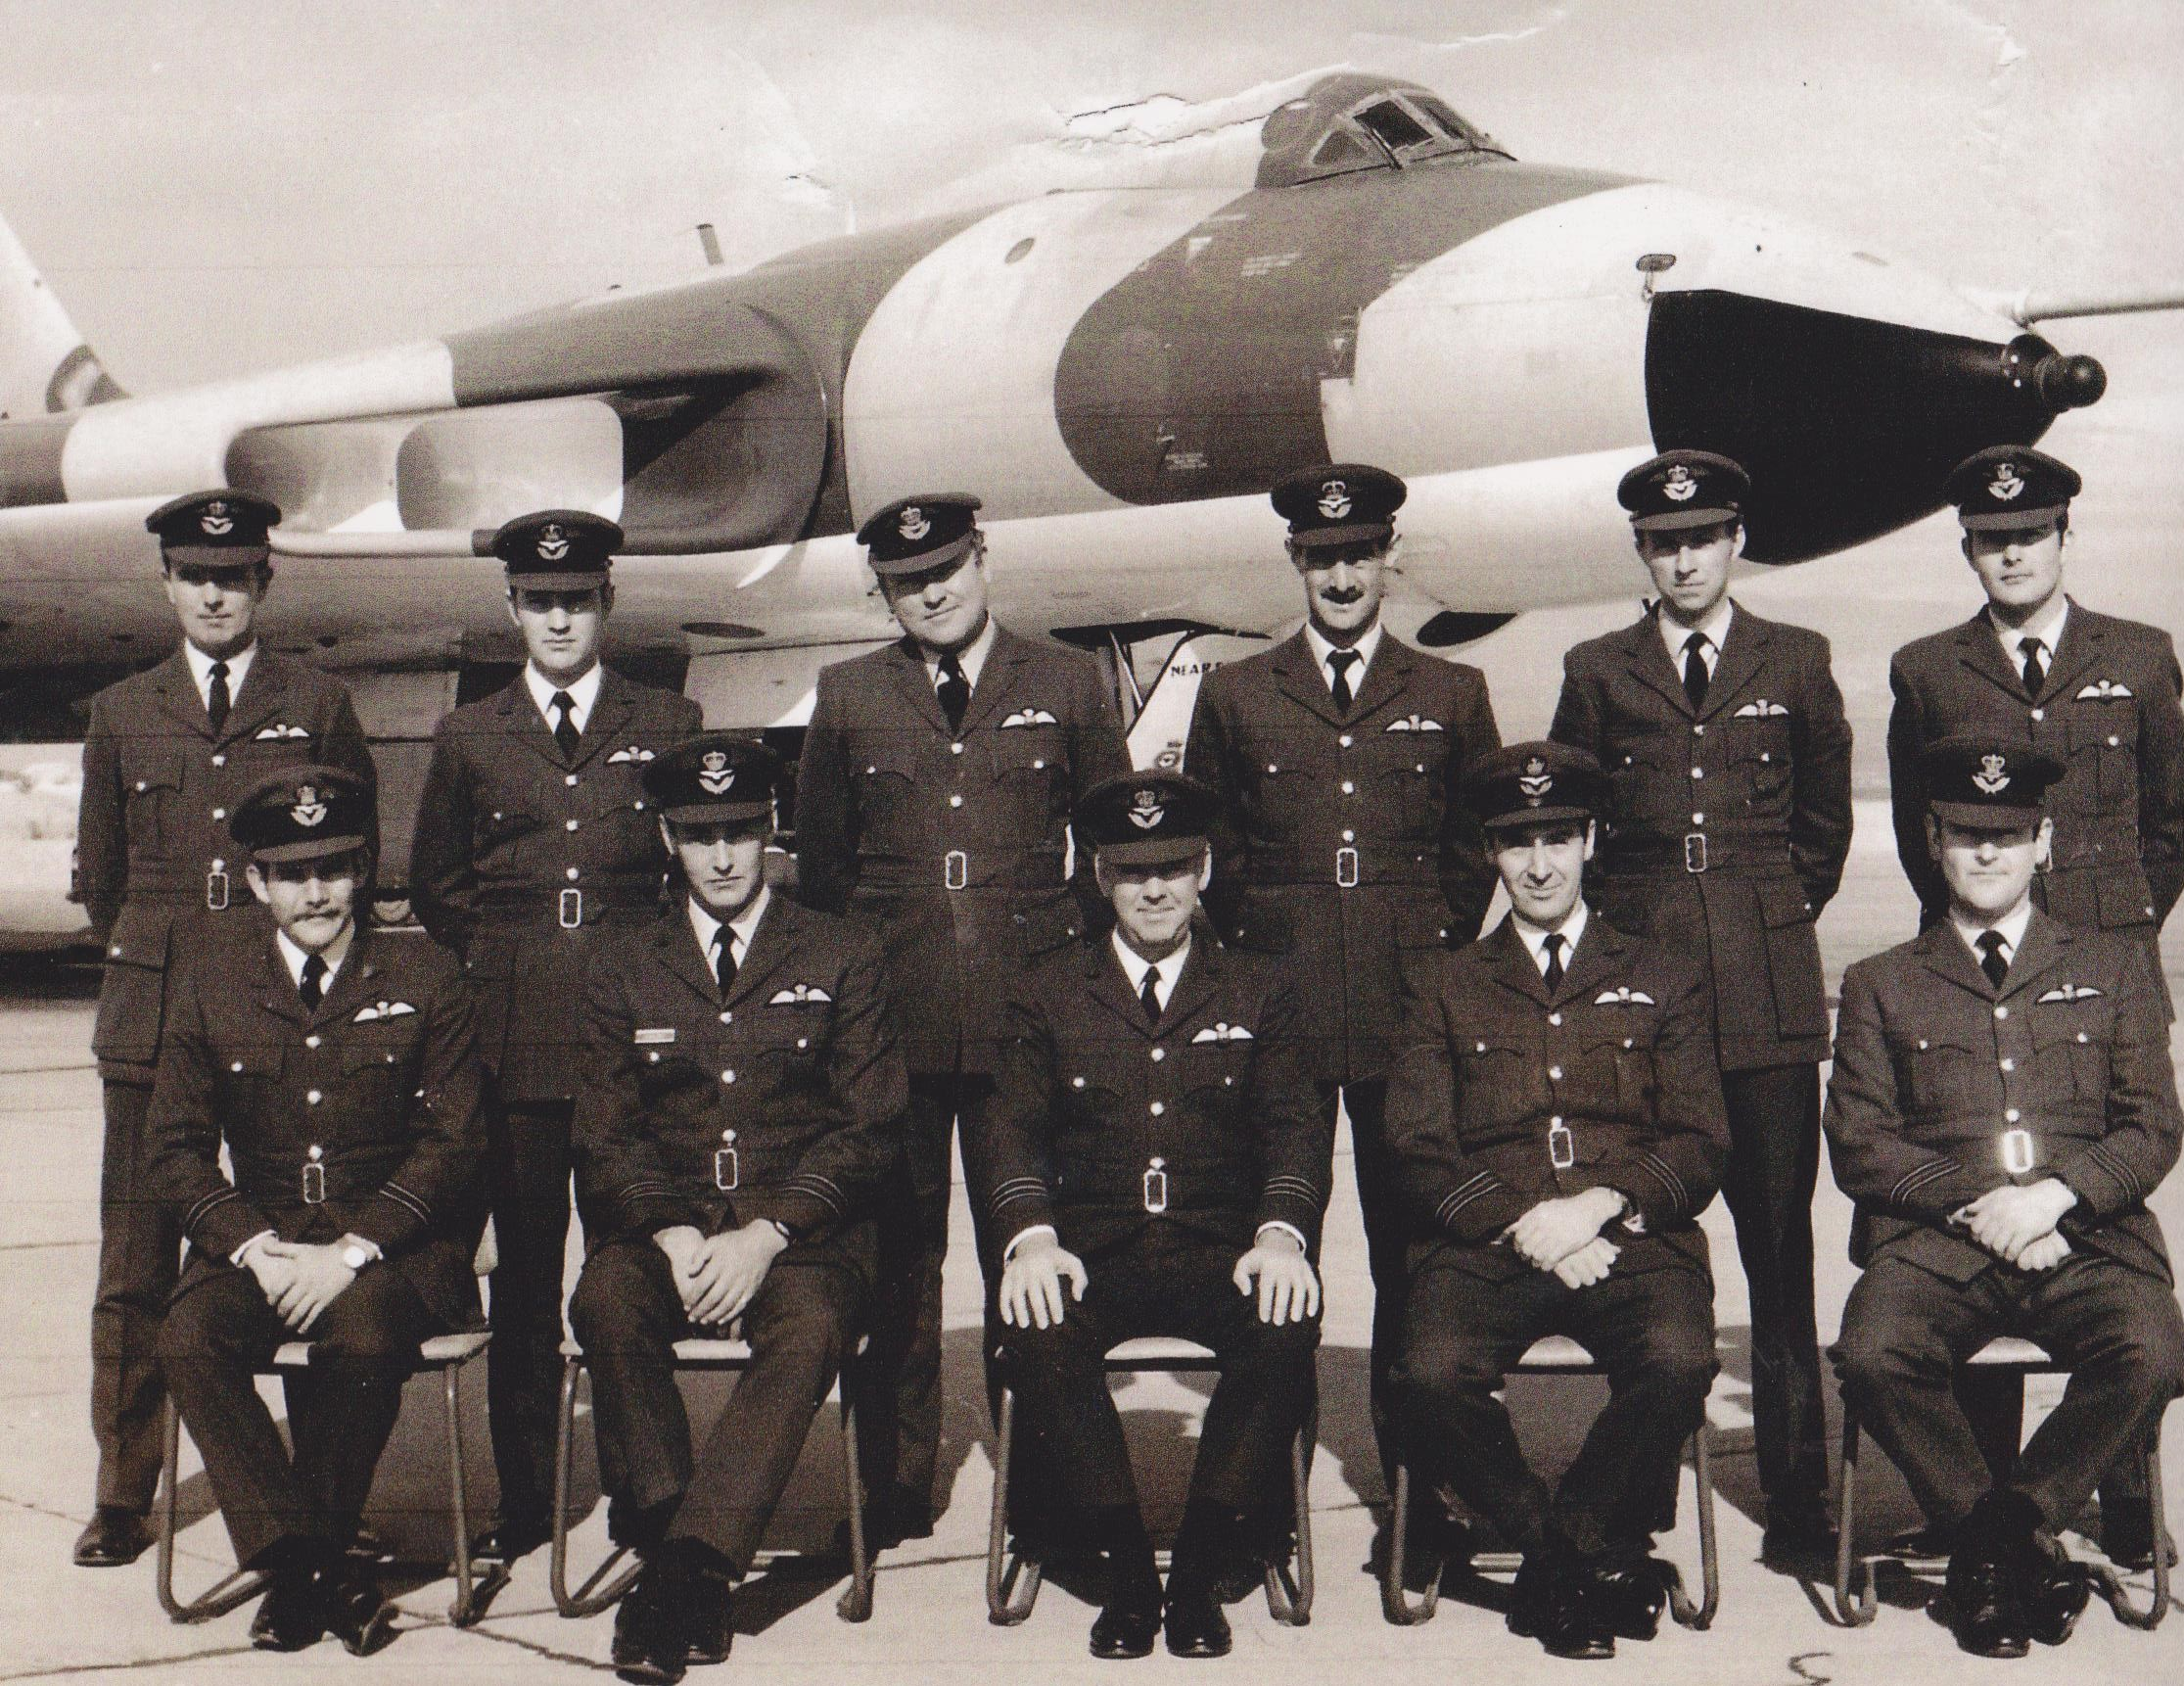 35squadronresearchgroup Image